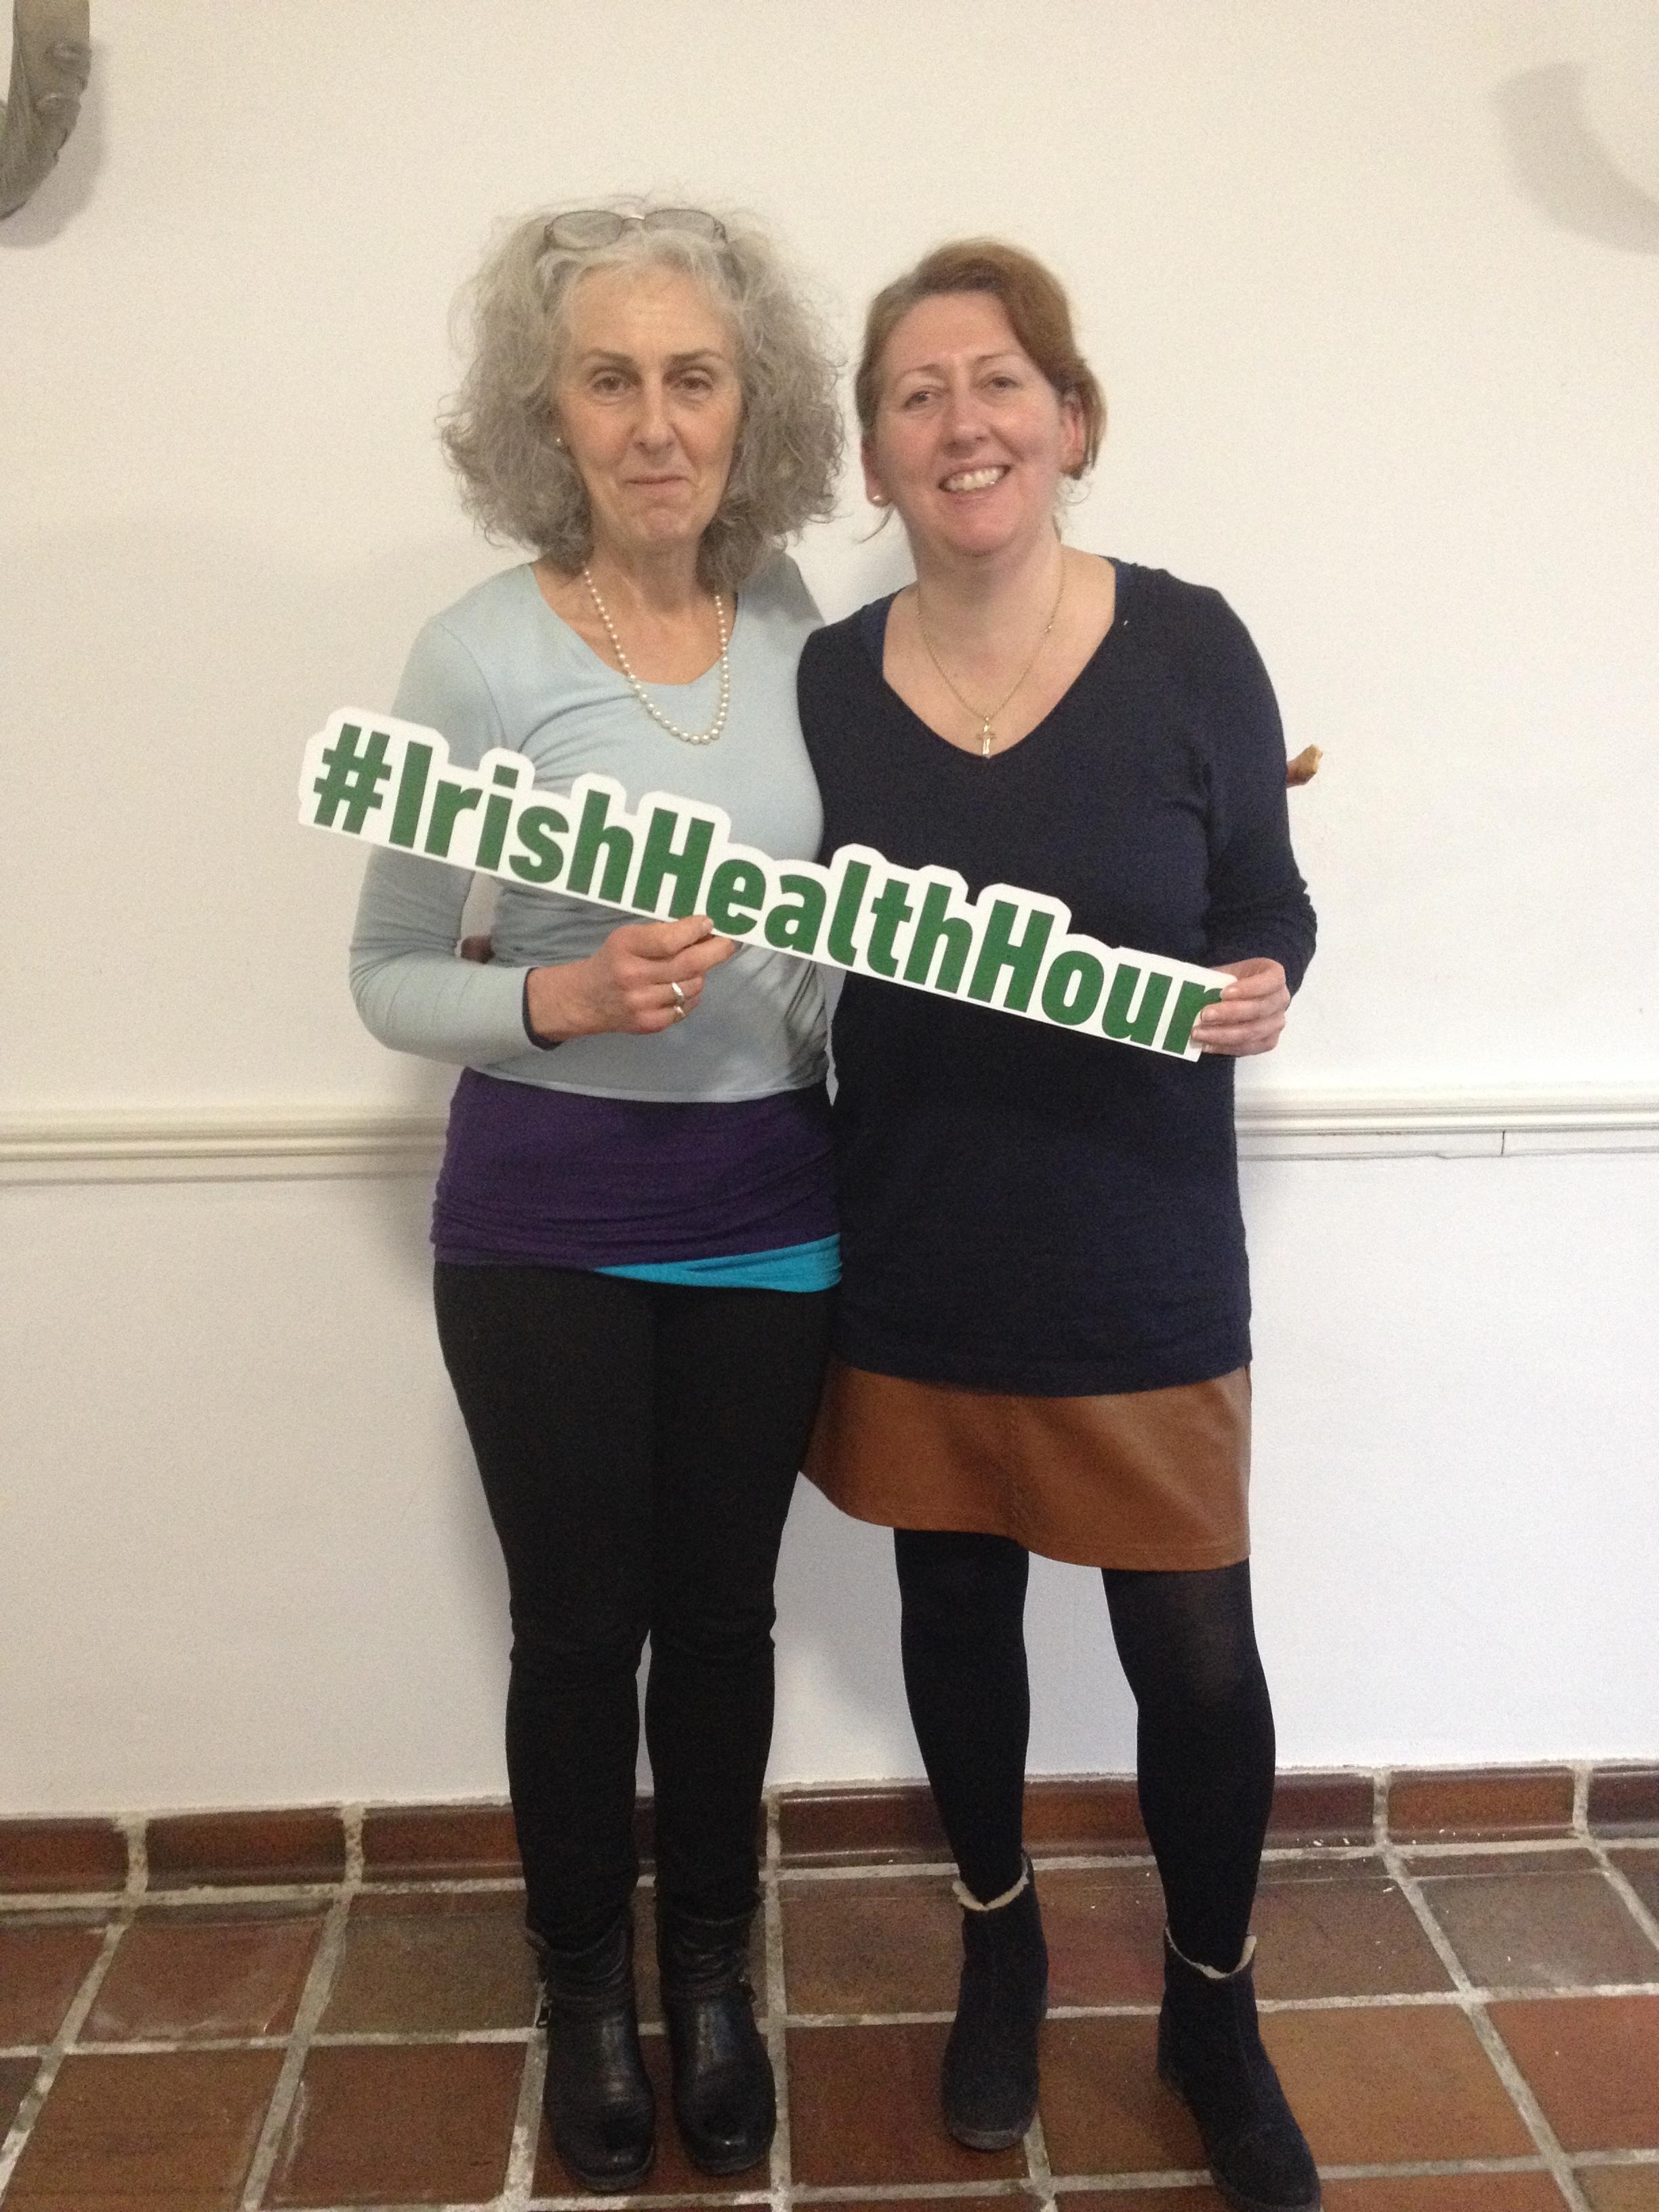 IrishHealthHour meets Buddy Bench Ireland in Kilkenny